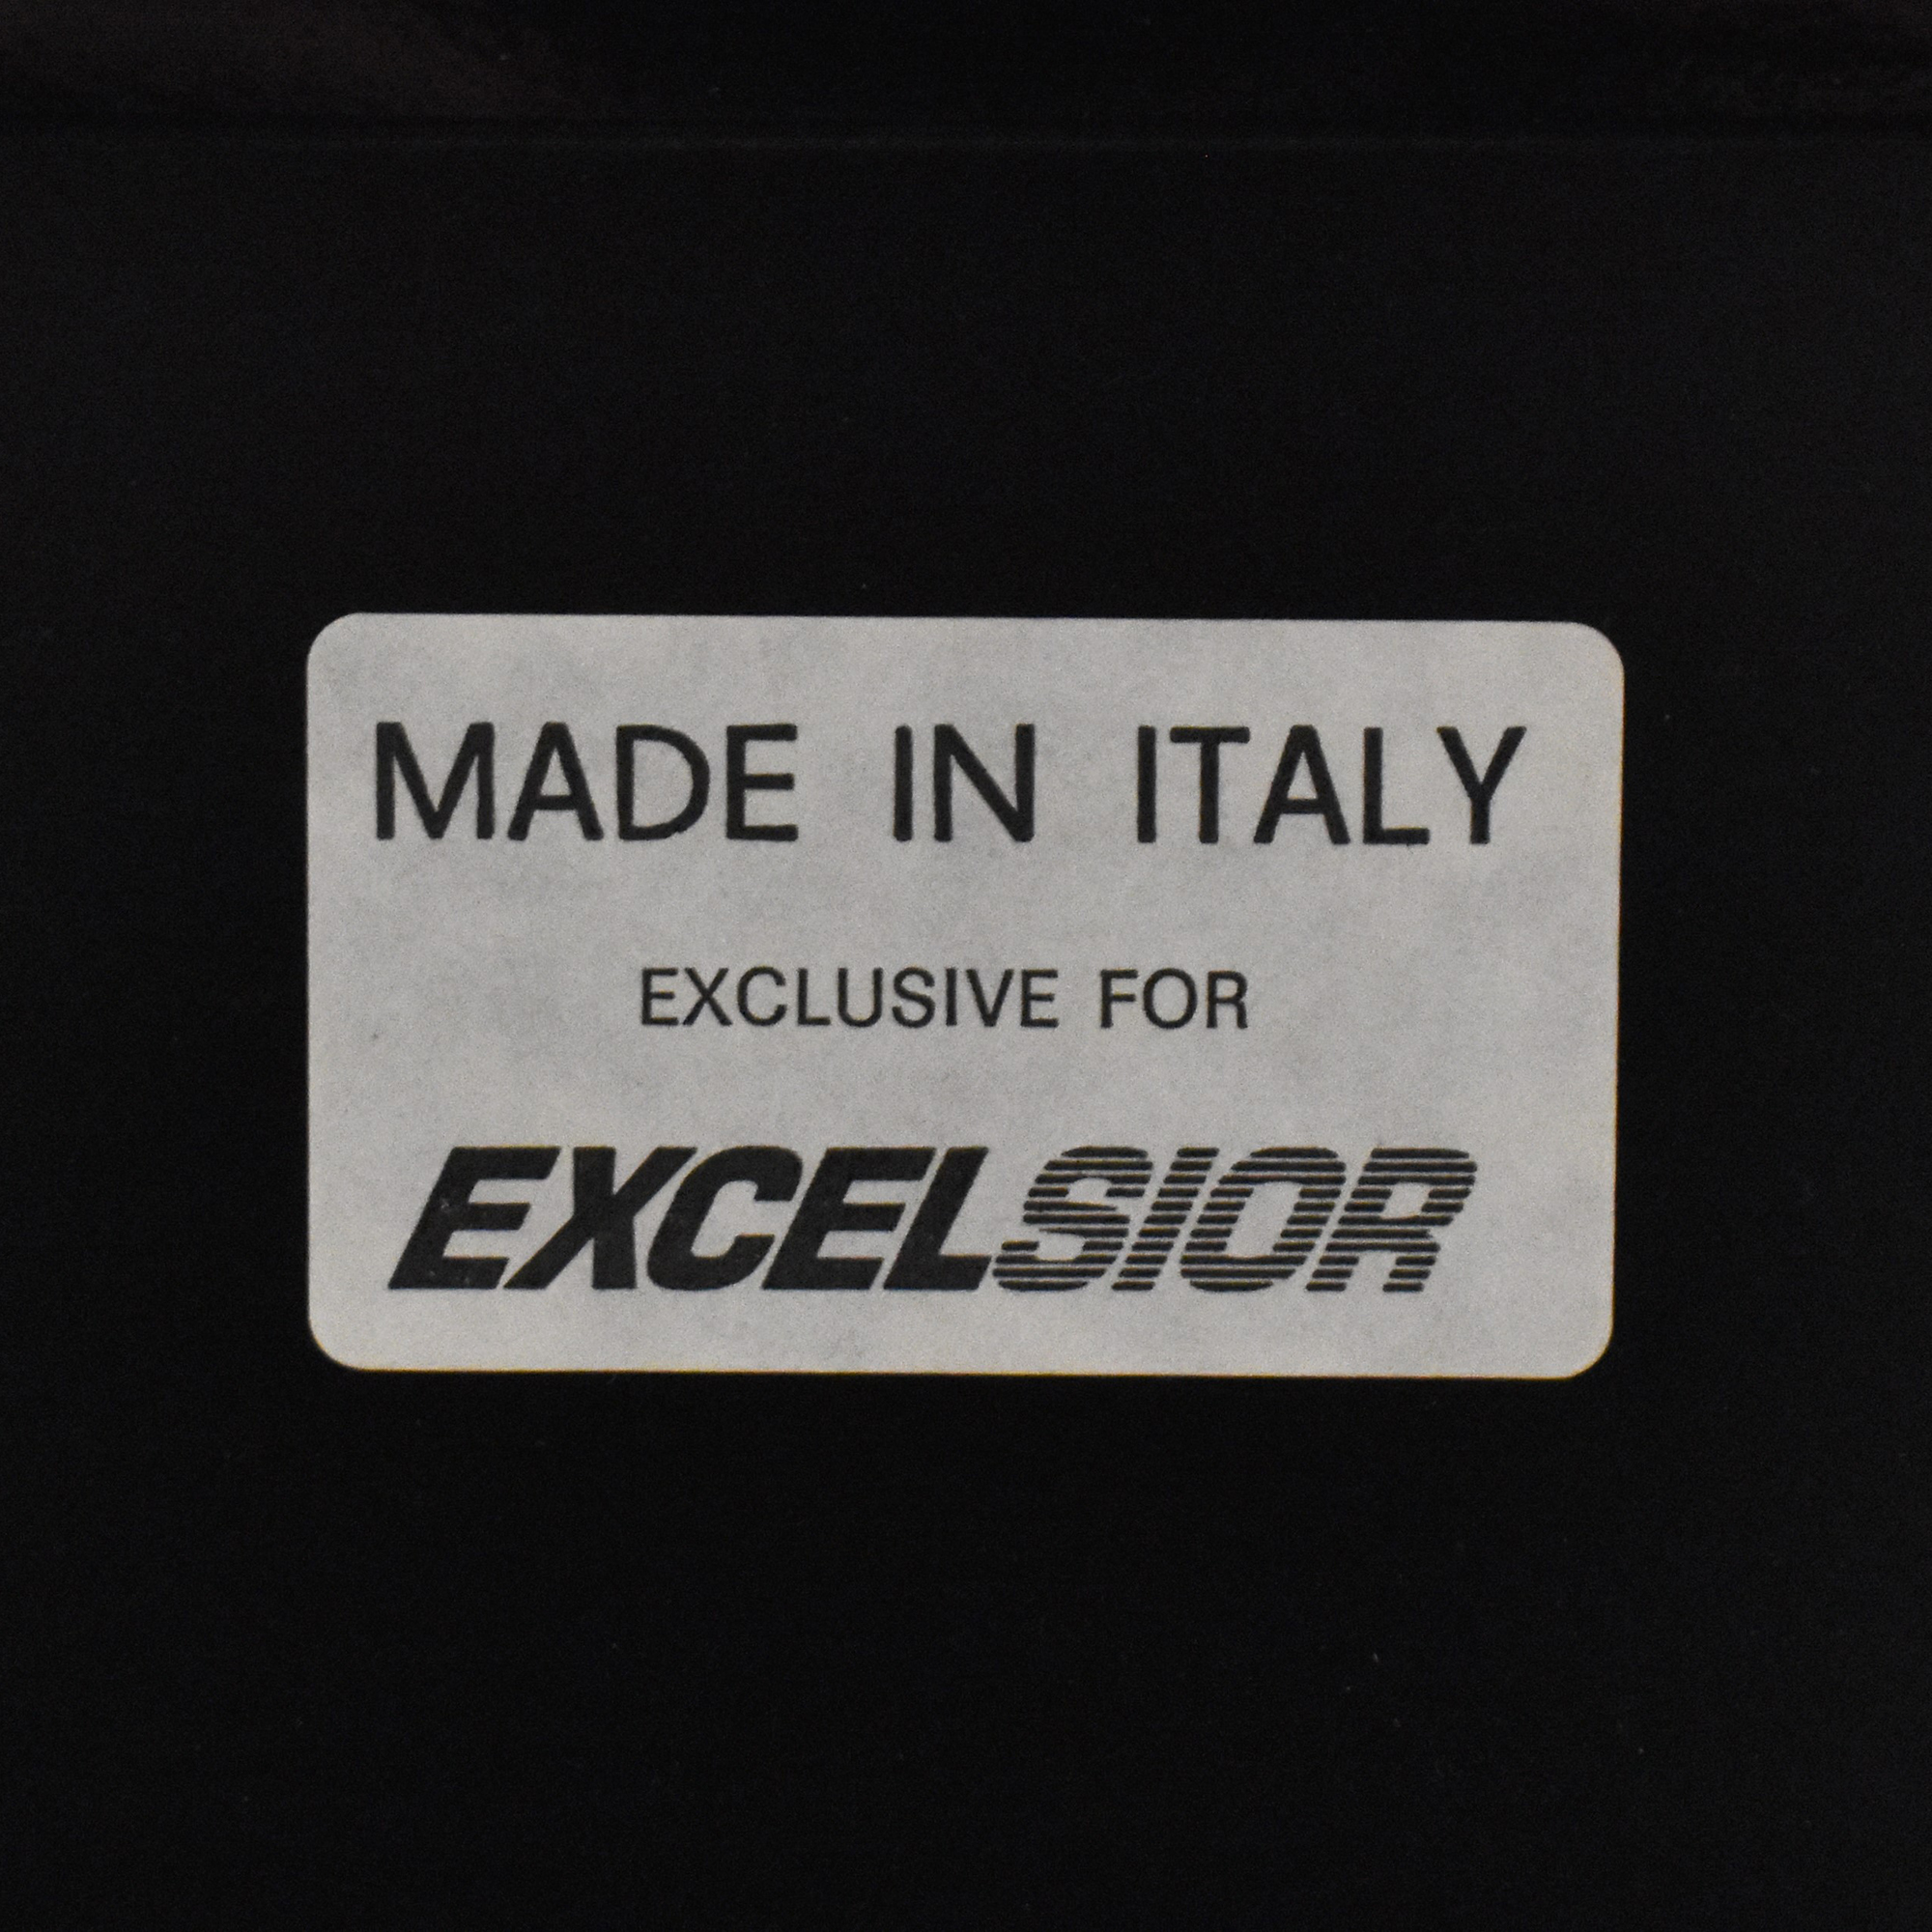 Excelsior Designs Excelsior Designs Cubby Sideboard price